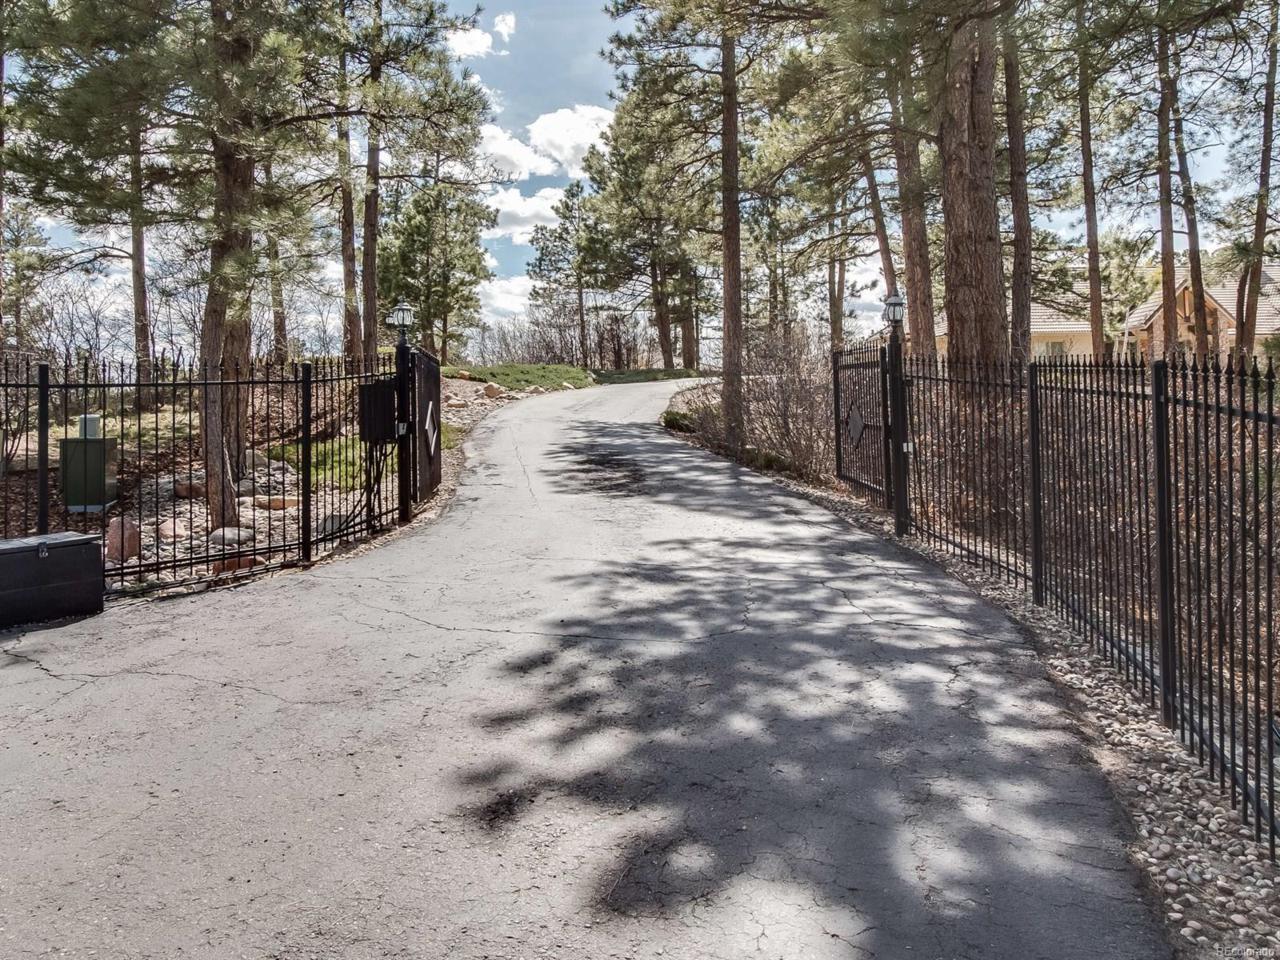 7858 Kelty Trail, Franktown, CO 80116 (MLS #8282908) :: 8z Real Estate